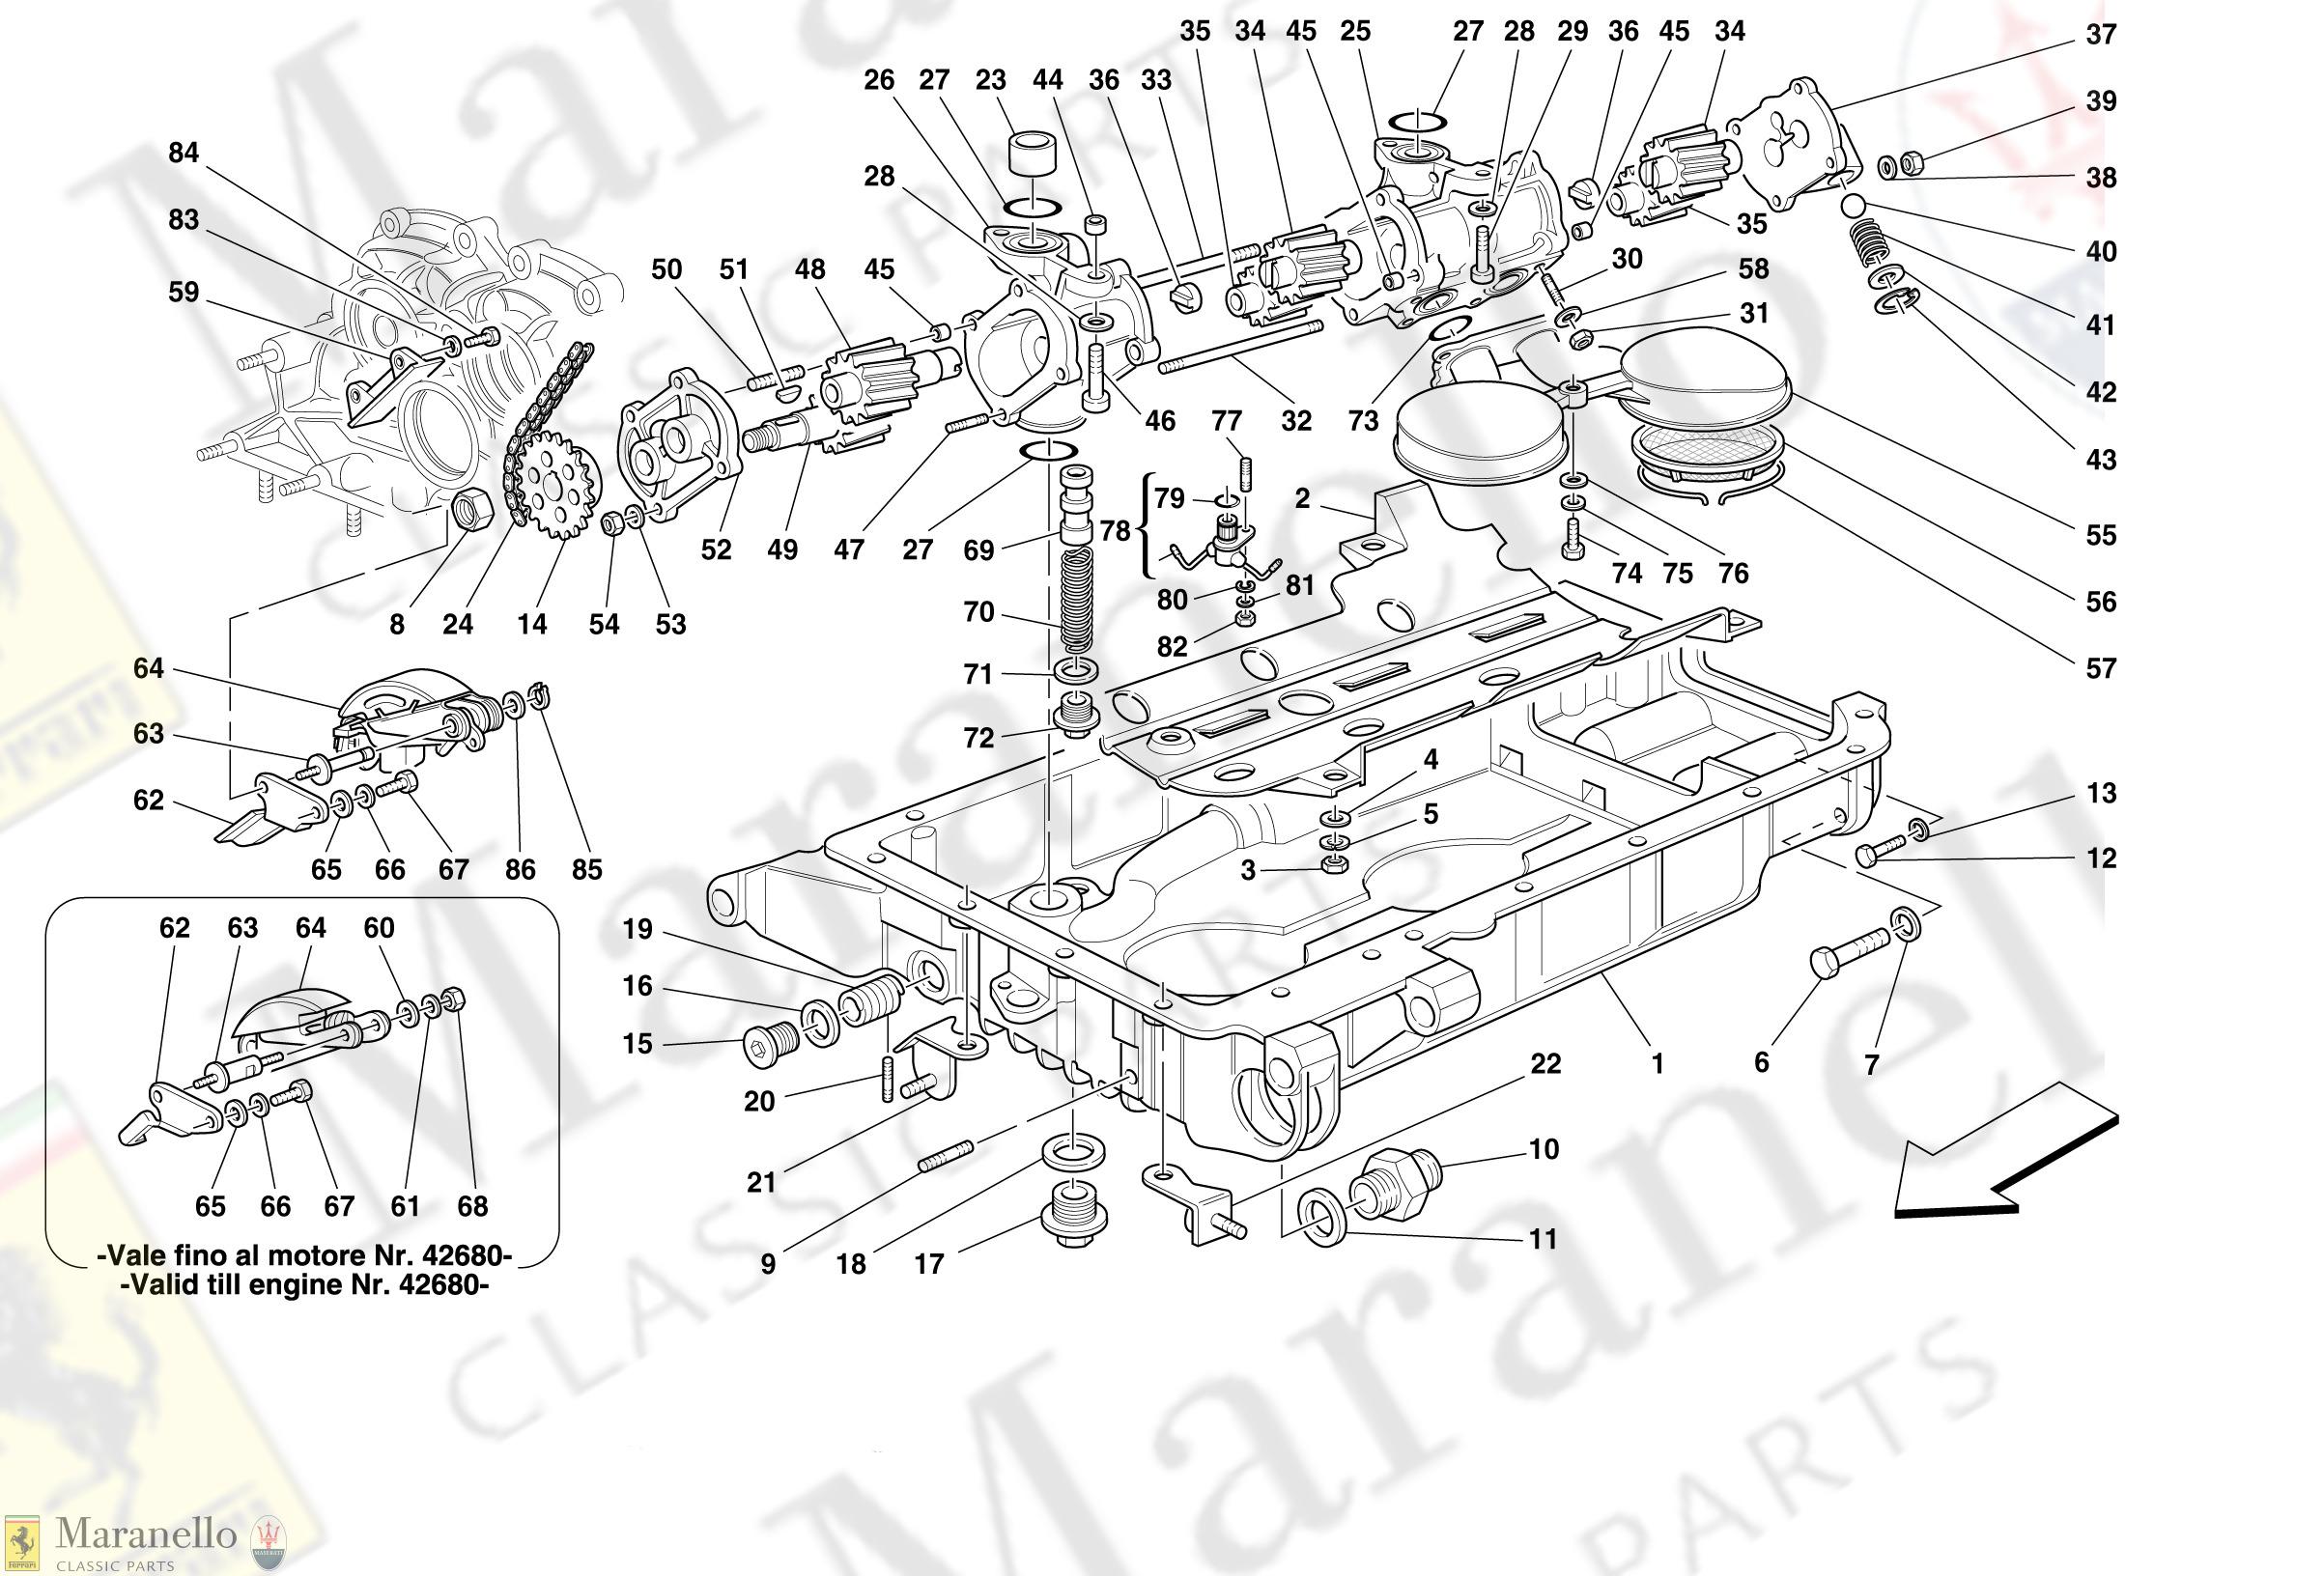 Mgt 46 Parts Diagram | Wiring Diagram Case Wiring Diagram on case parts diagram, case pump diagram, gmc truck transfer case diagram, bobcat 310 parts diagram, case transmission diagram, case fan diagram, kubota hydraulics diagram, all wheel drive transfer case diagram, case flow diagram, case engine,